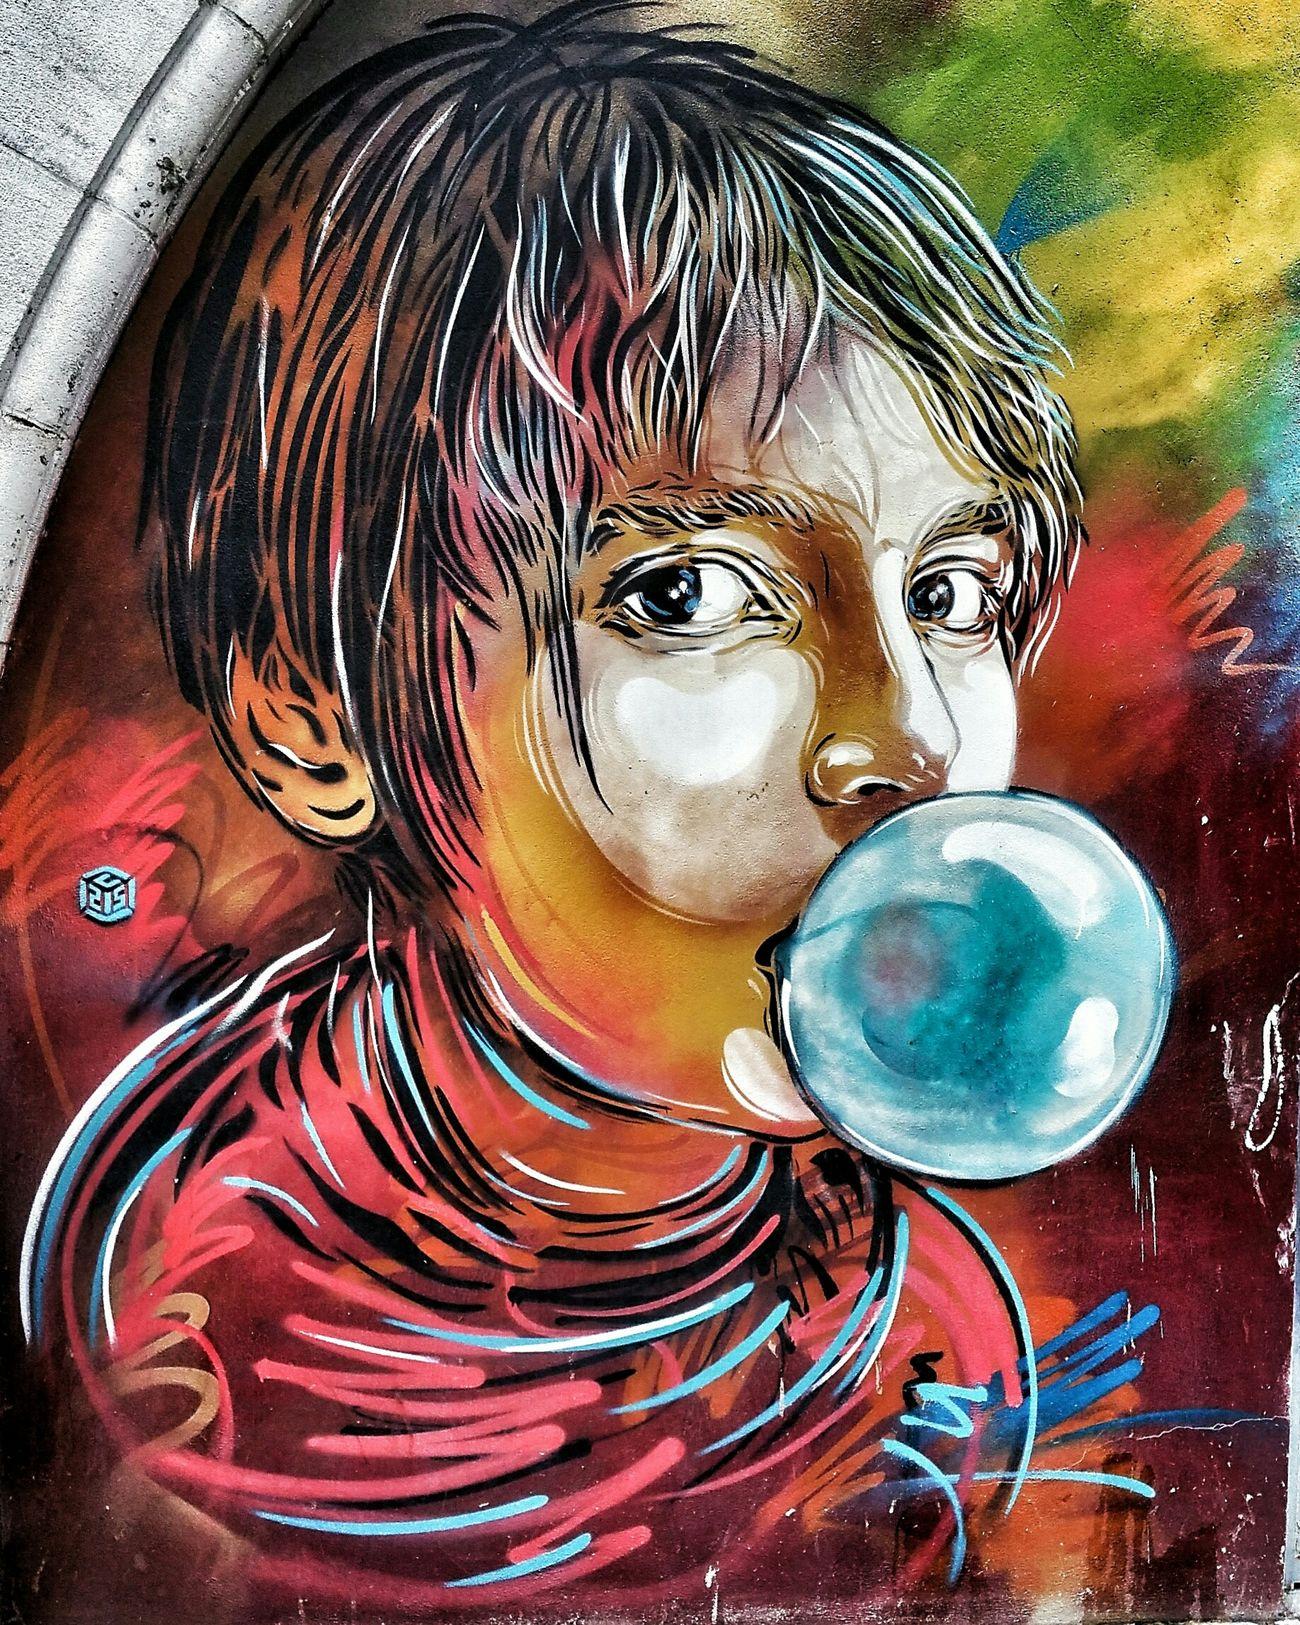 Paris Je T Aime Street Art/Graffiti Paris, France  Art Paris Tourism Paris ❤ Street Art Tourism Urban Streetart Paris Love ♥ France Paris13 Galaxynote4